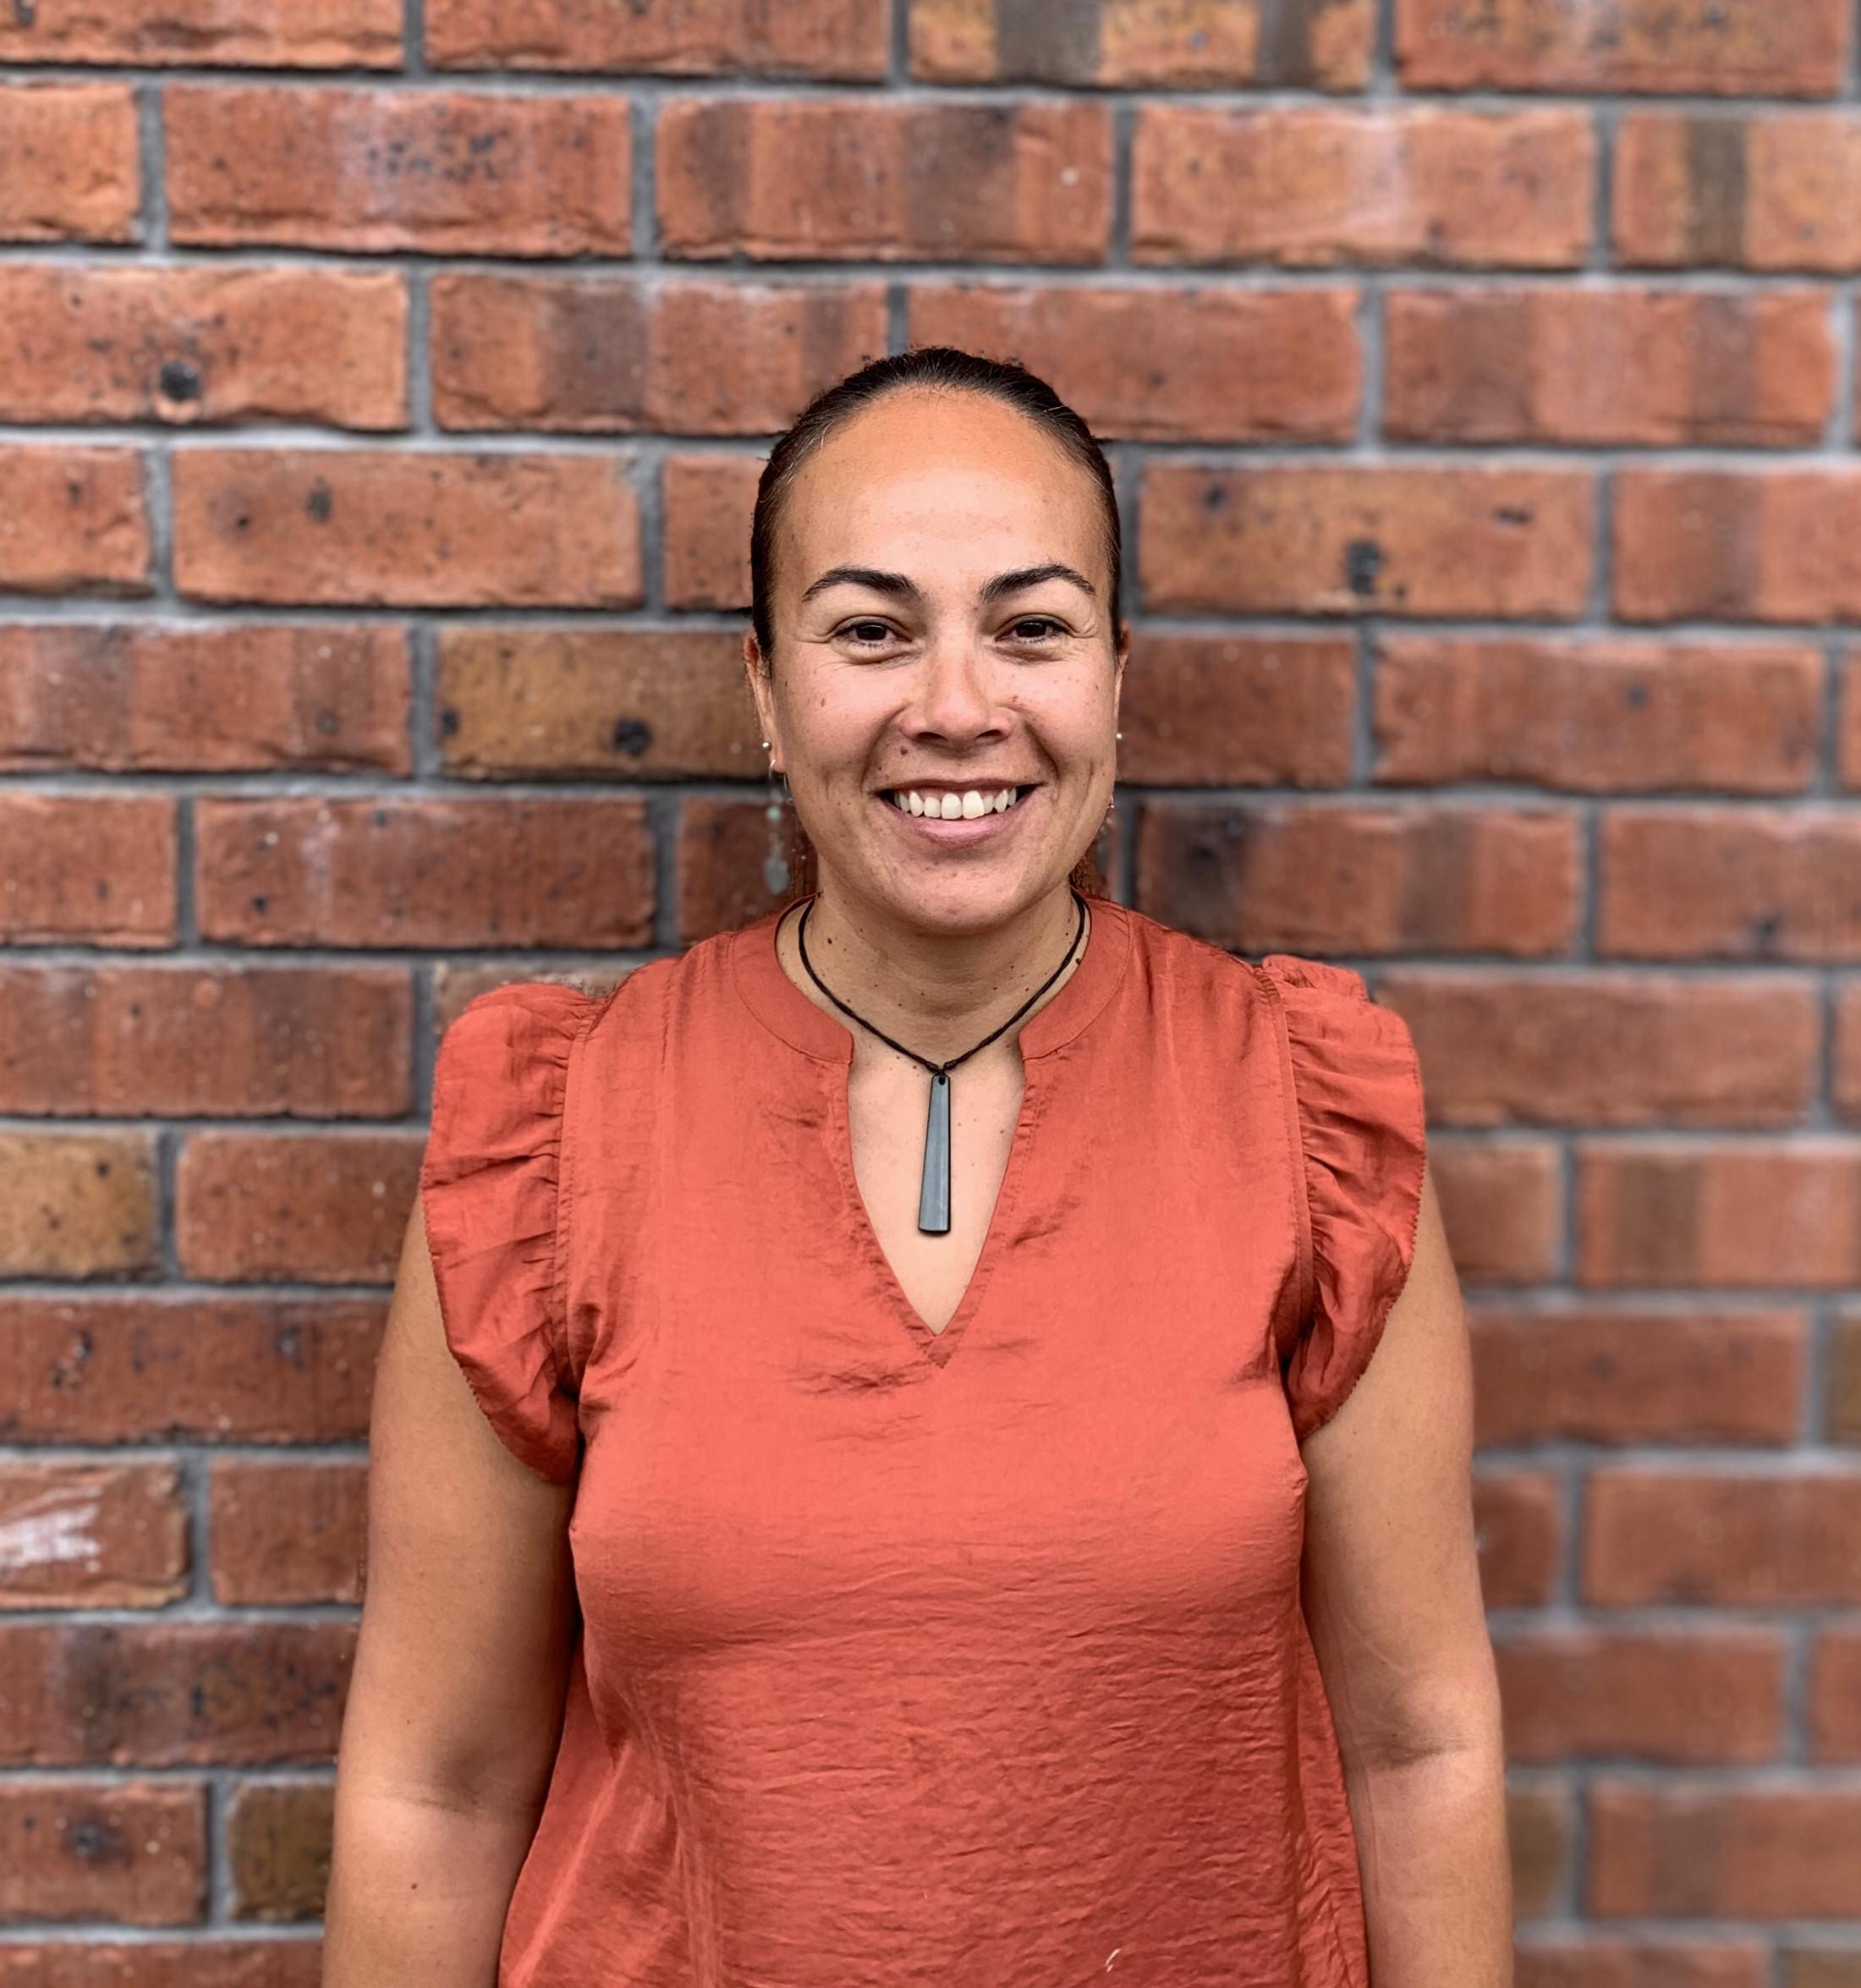 Learning Support Assistant - Awanga McGeady